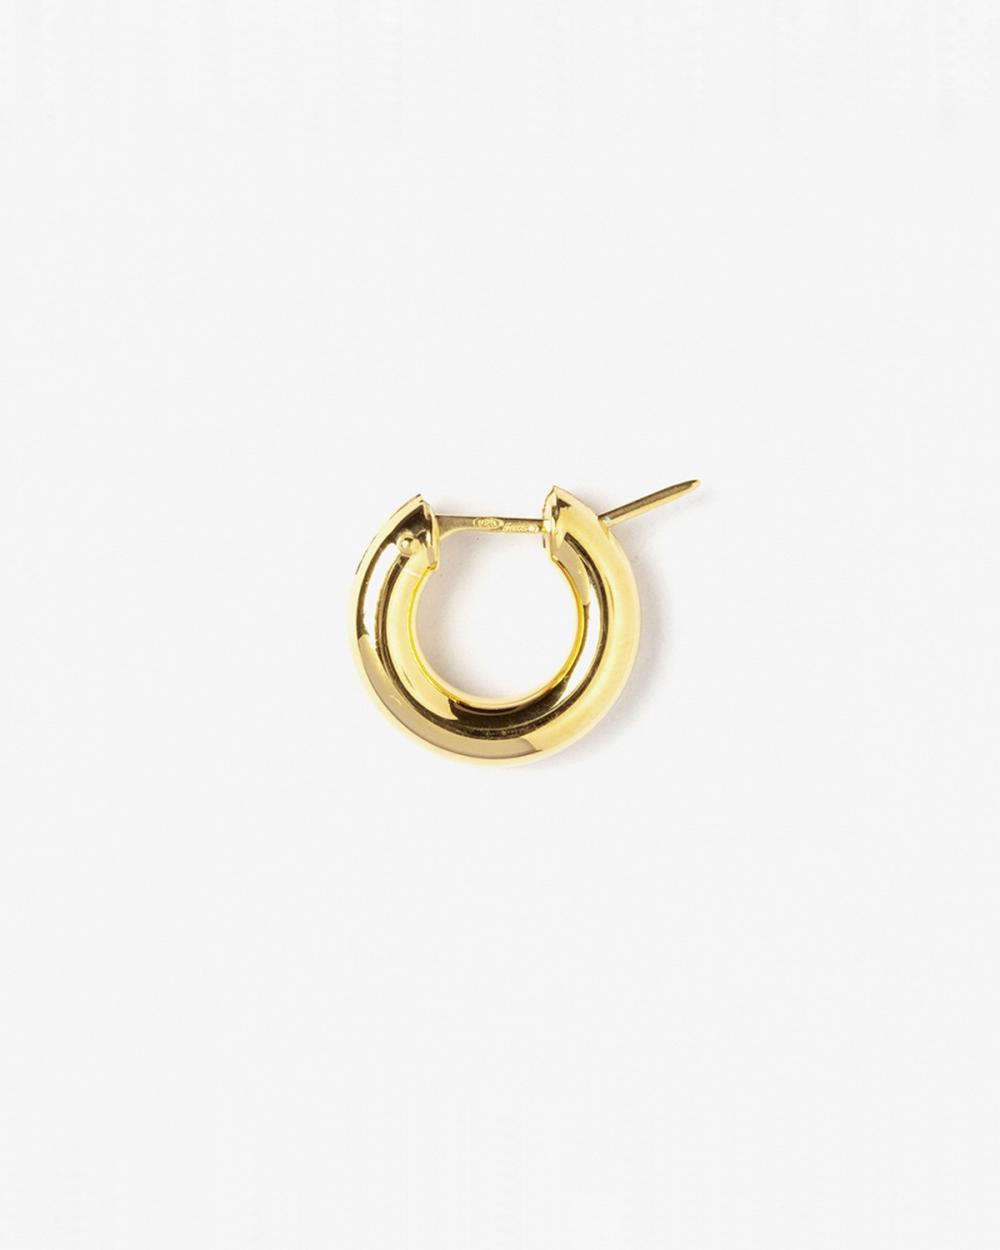 round tube 4 closing bridge single hoop earring d8 mm polished yellow gold